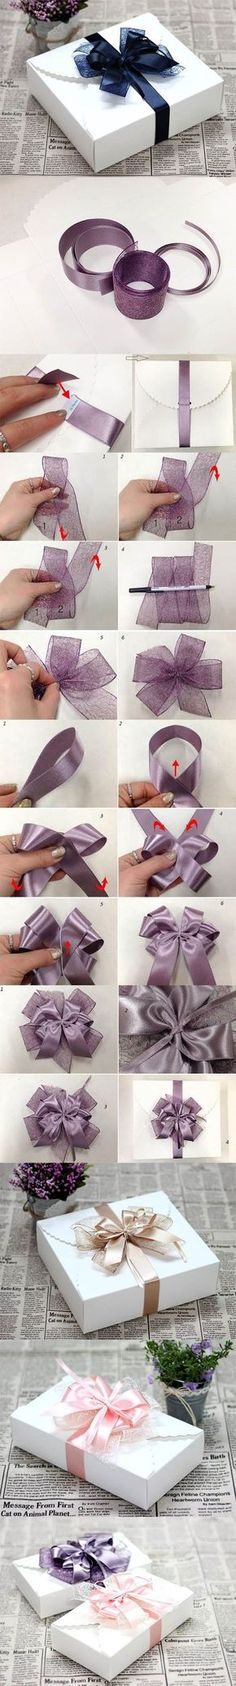 DIY Ribbon Bow for Gift Box Packaging   iCreativeIdeas.com LIKE Us on Facebook ==> https://www.facebook.com/icreativeideas